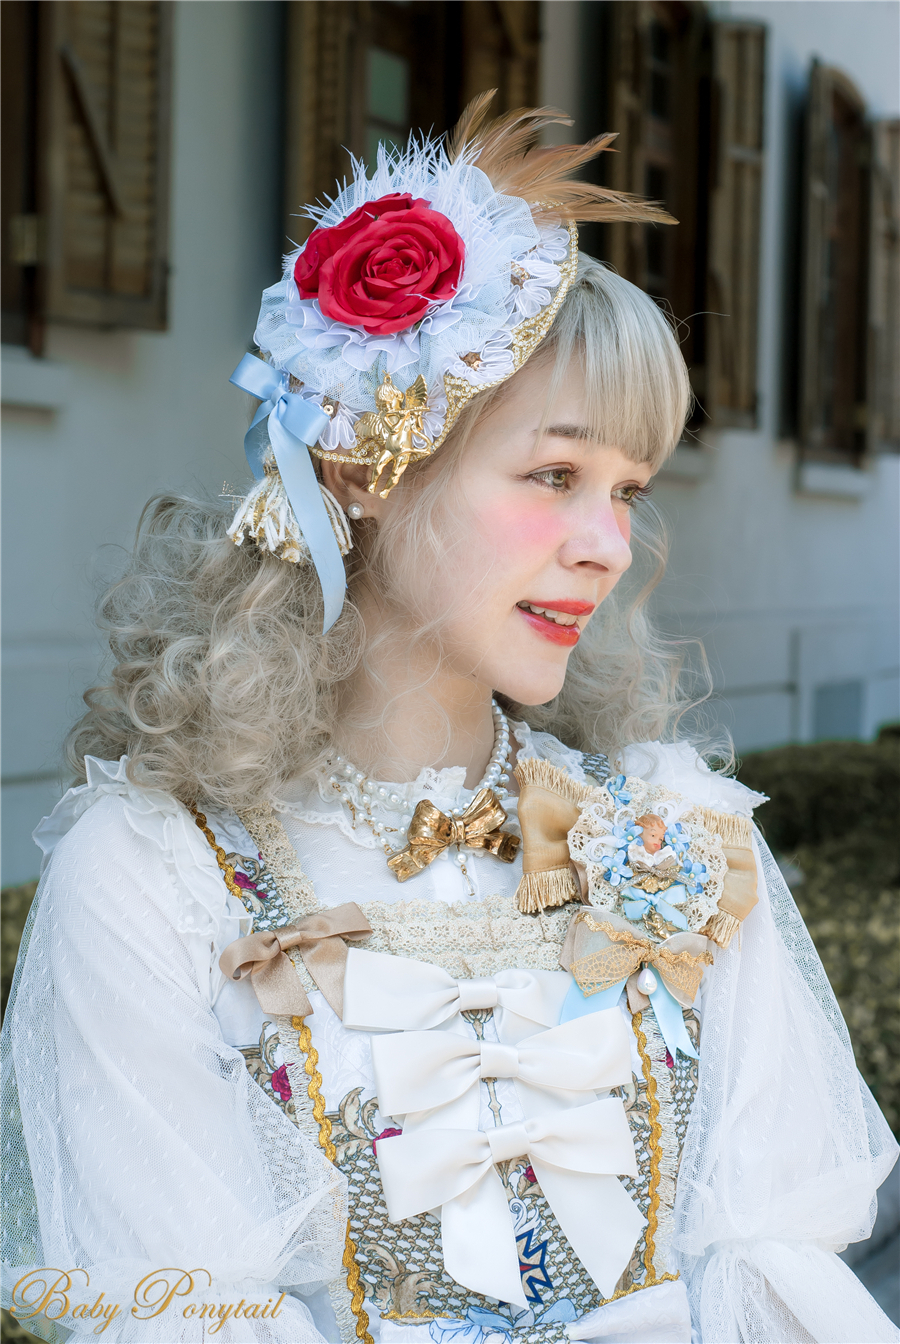 Baby Ponytail_Circus Princess_Silver JSK_Claudia08.jpg